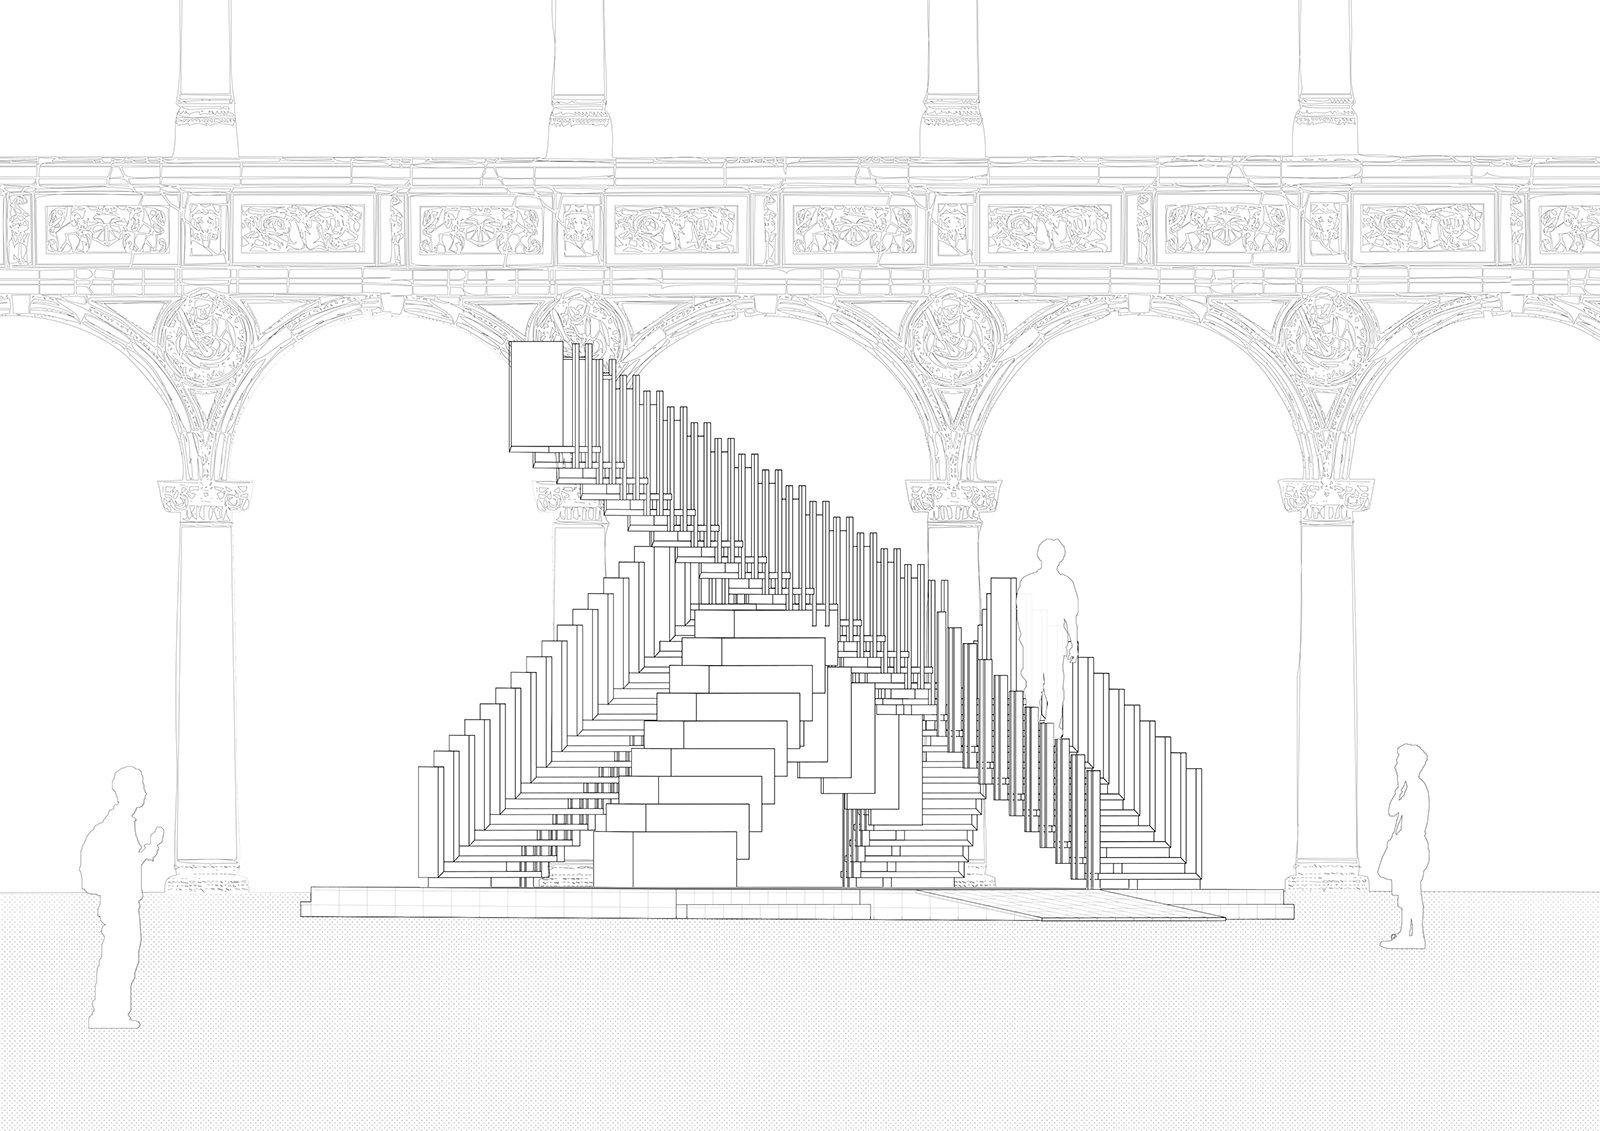 DRMM - Endless Stair